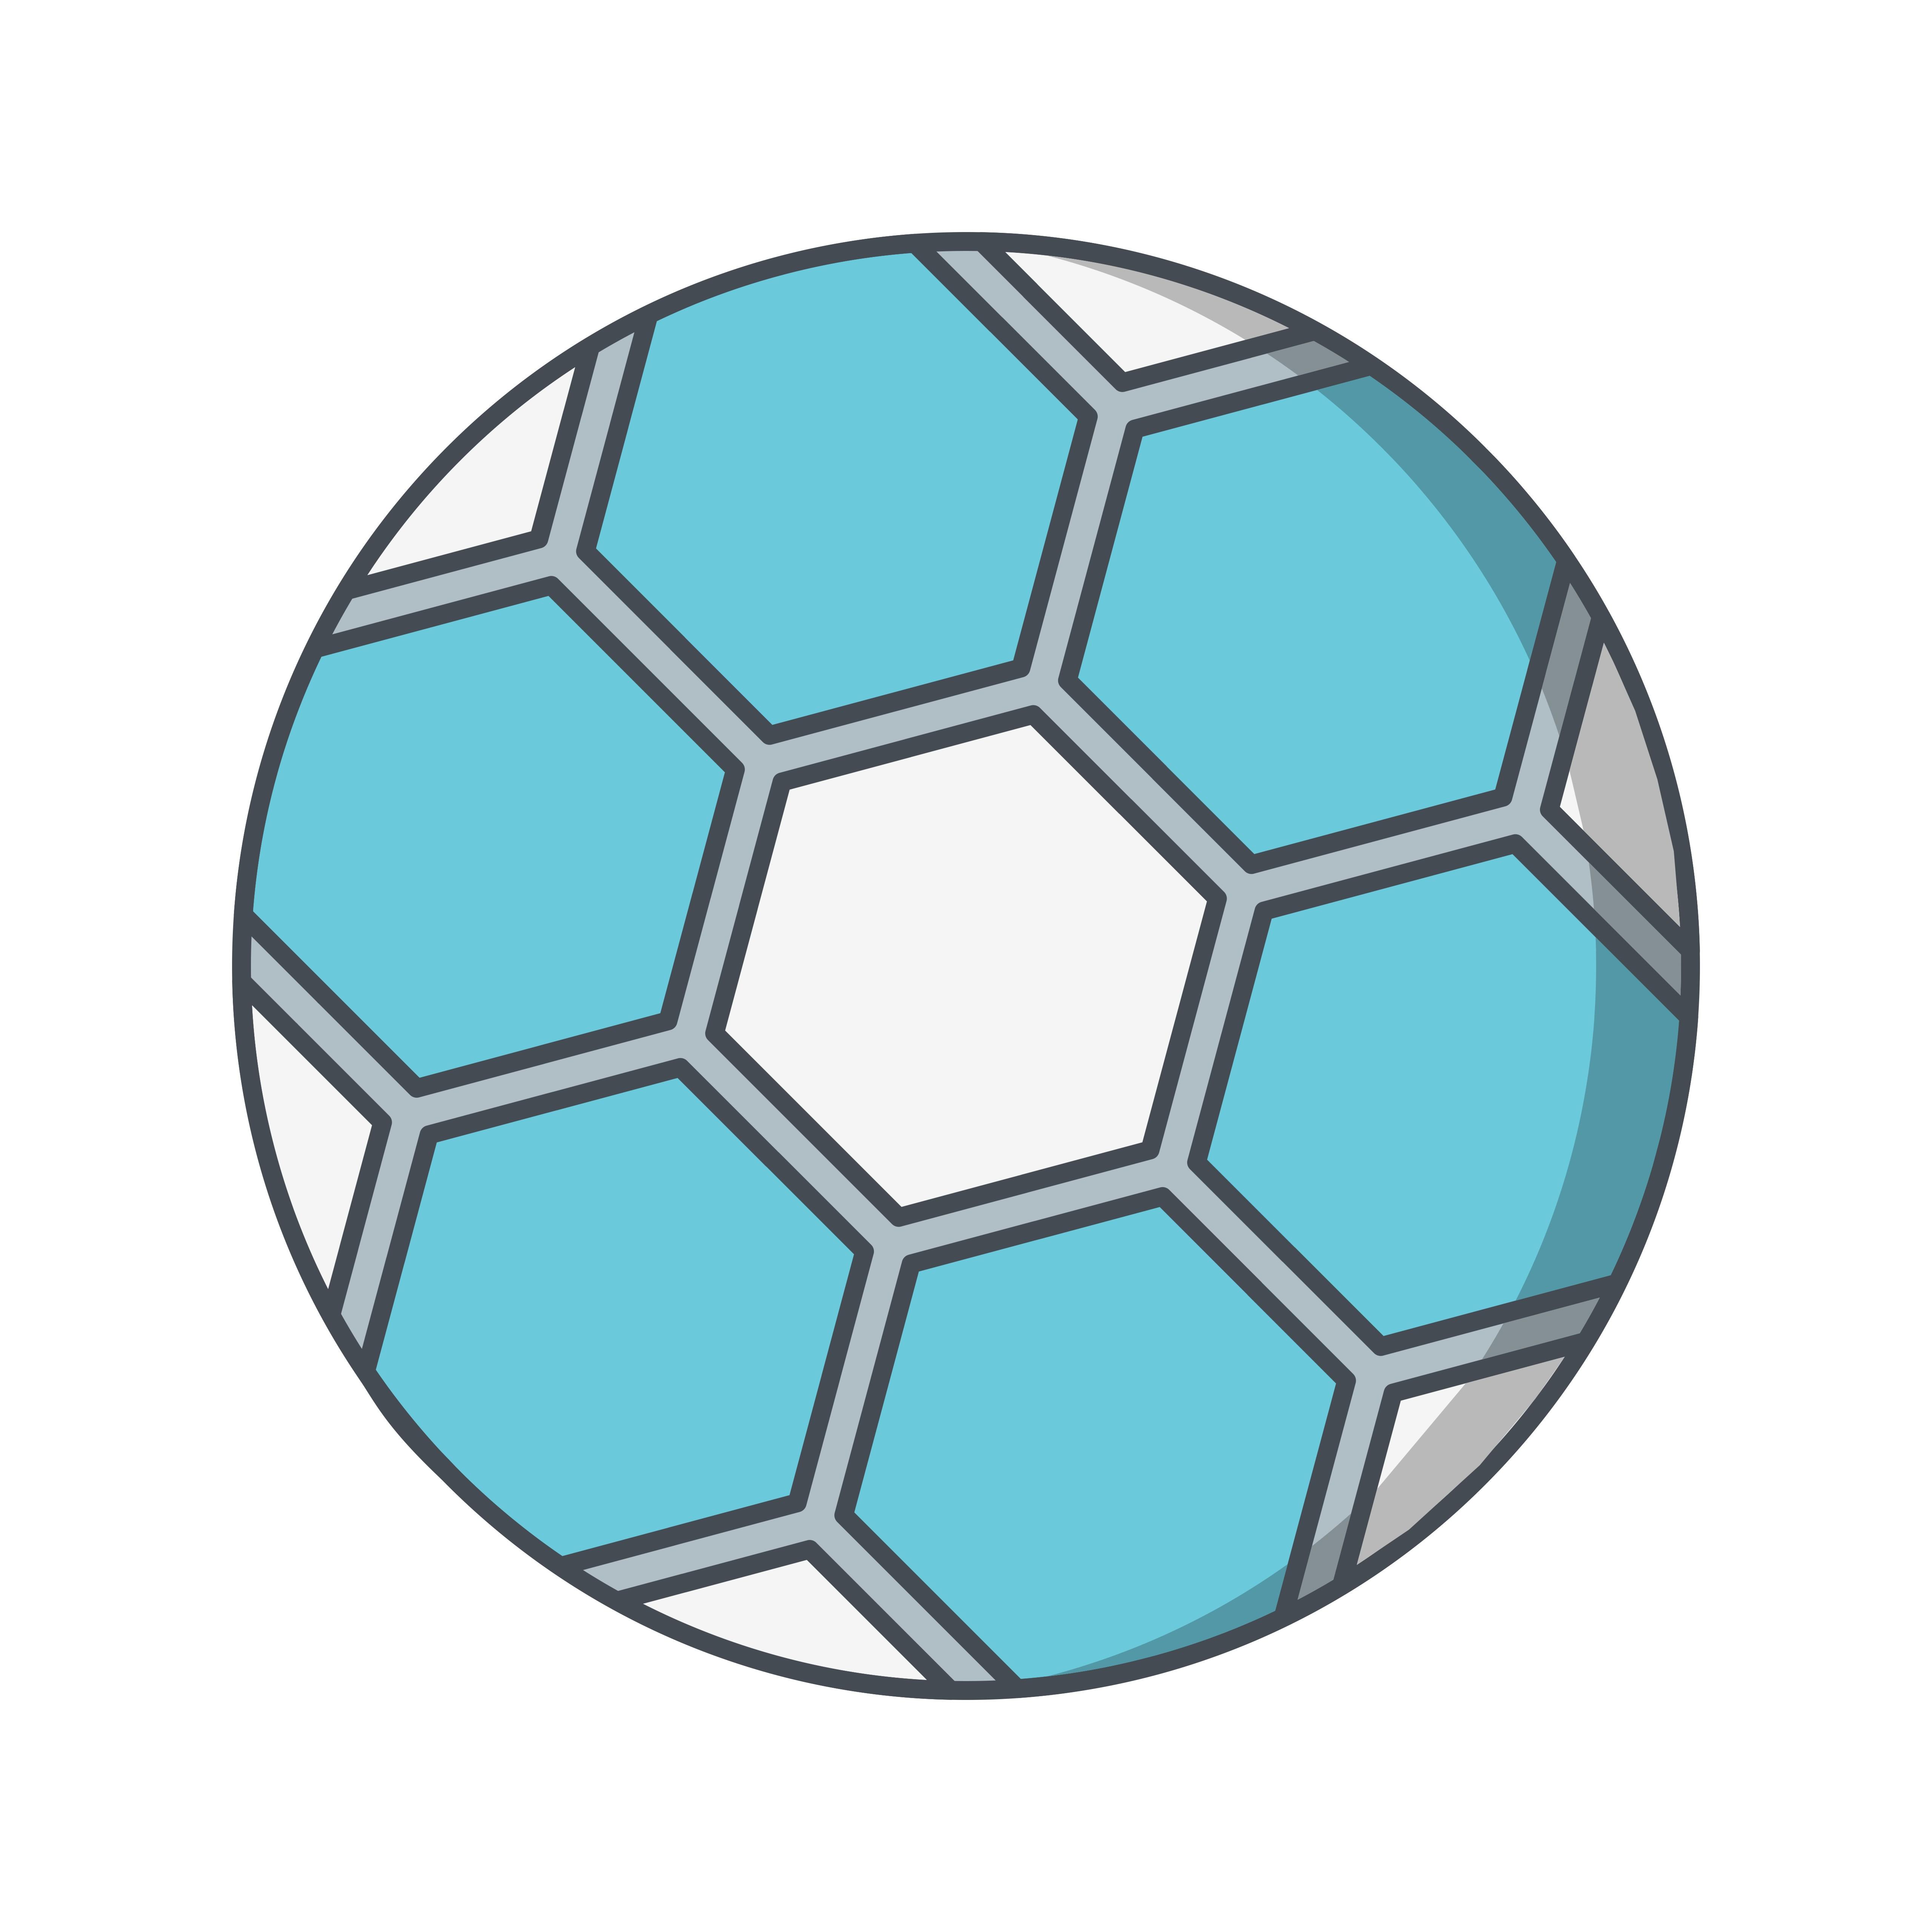 Football Icon Vector Illustration 422087 Vector Art at ...